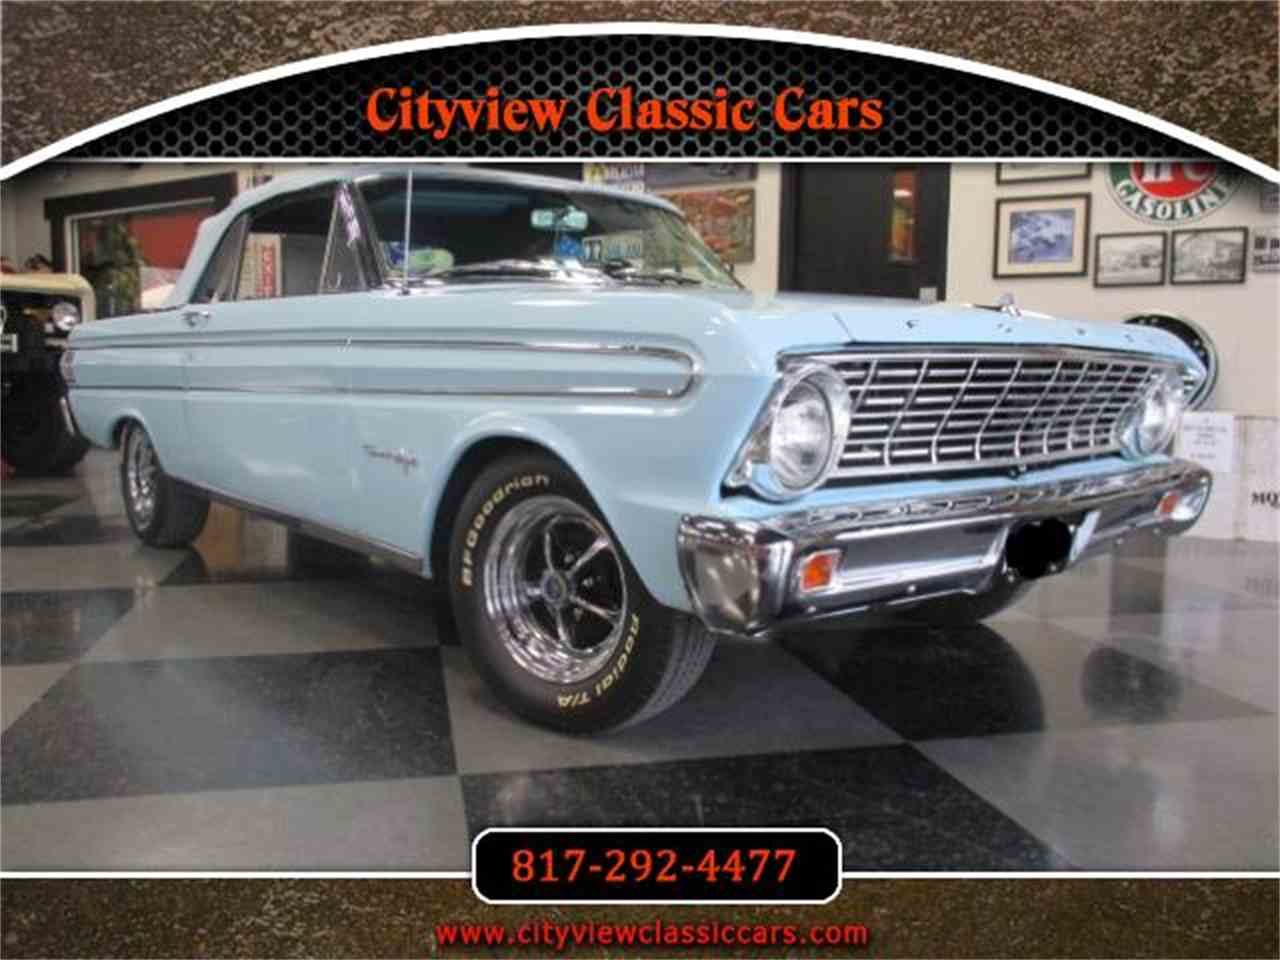 1964 Ford Falcon for Sale | ClassicCars.com | CC-963509